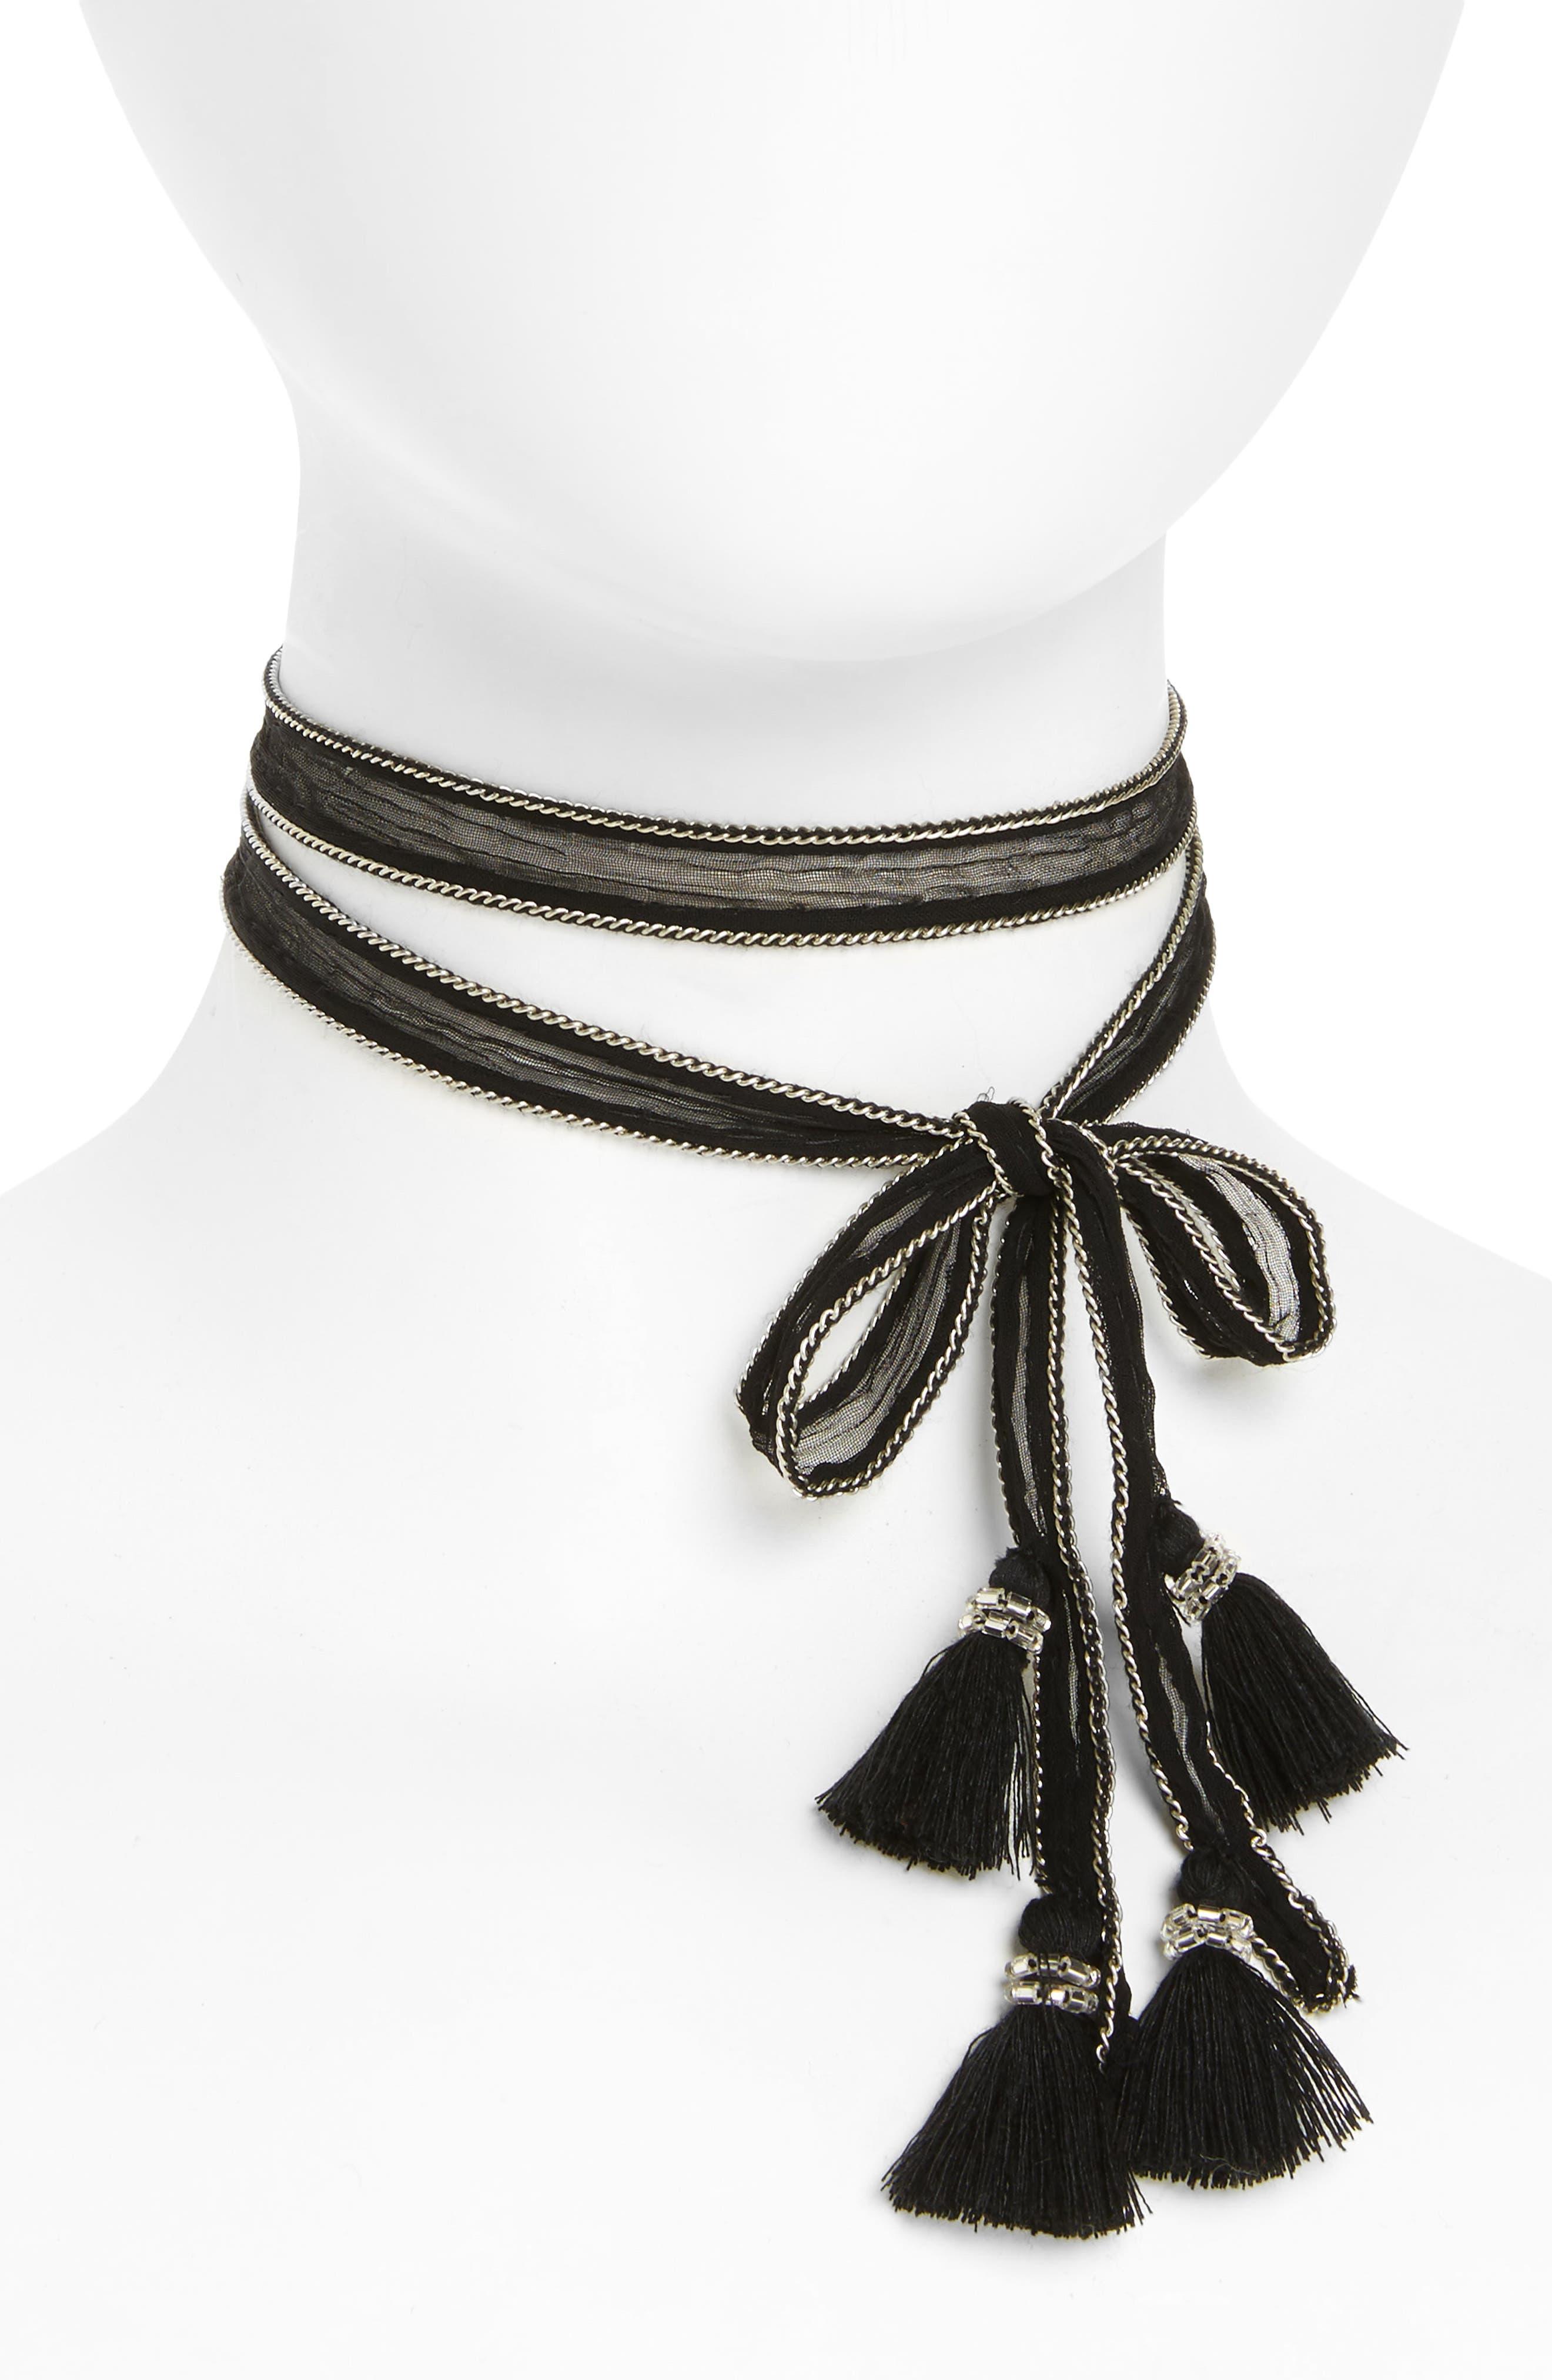 Main Image - Chan Luu Chiffon Tie Necklace